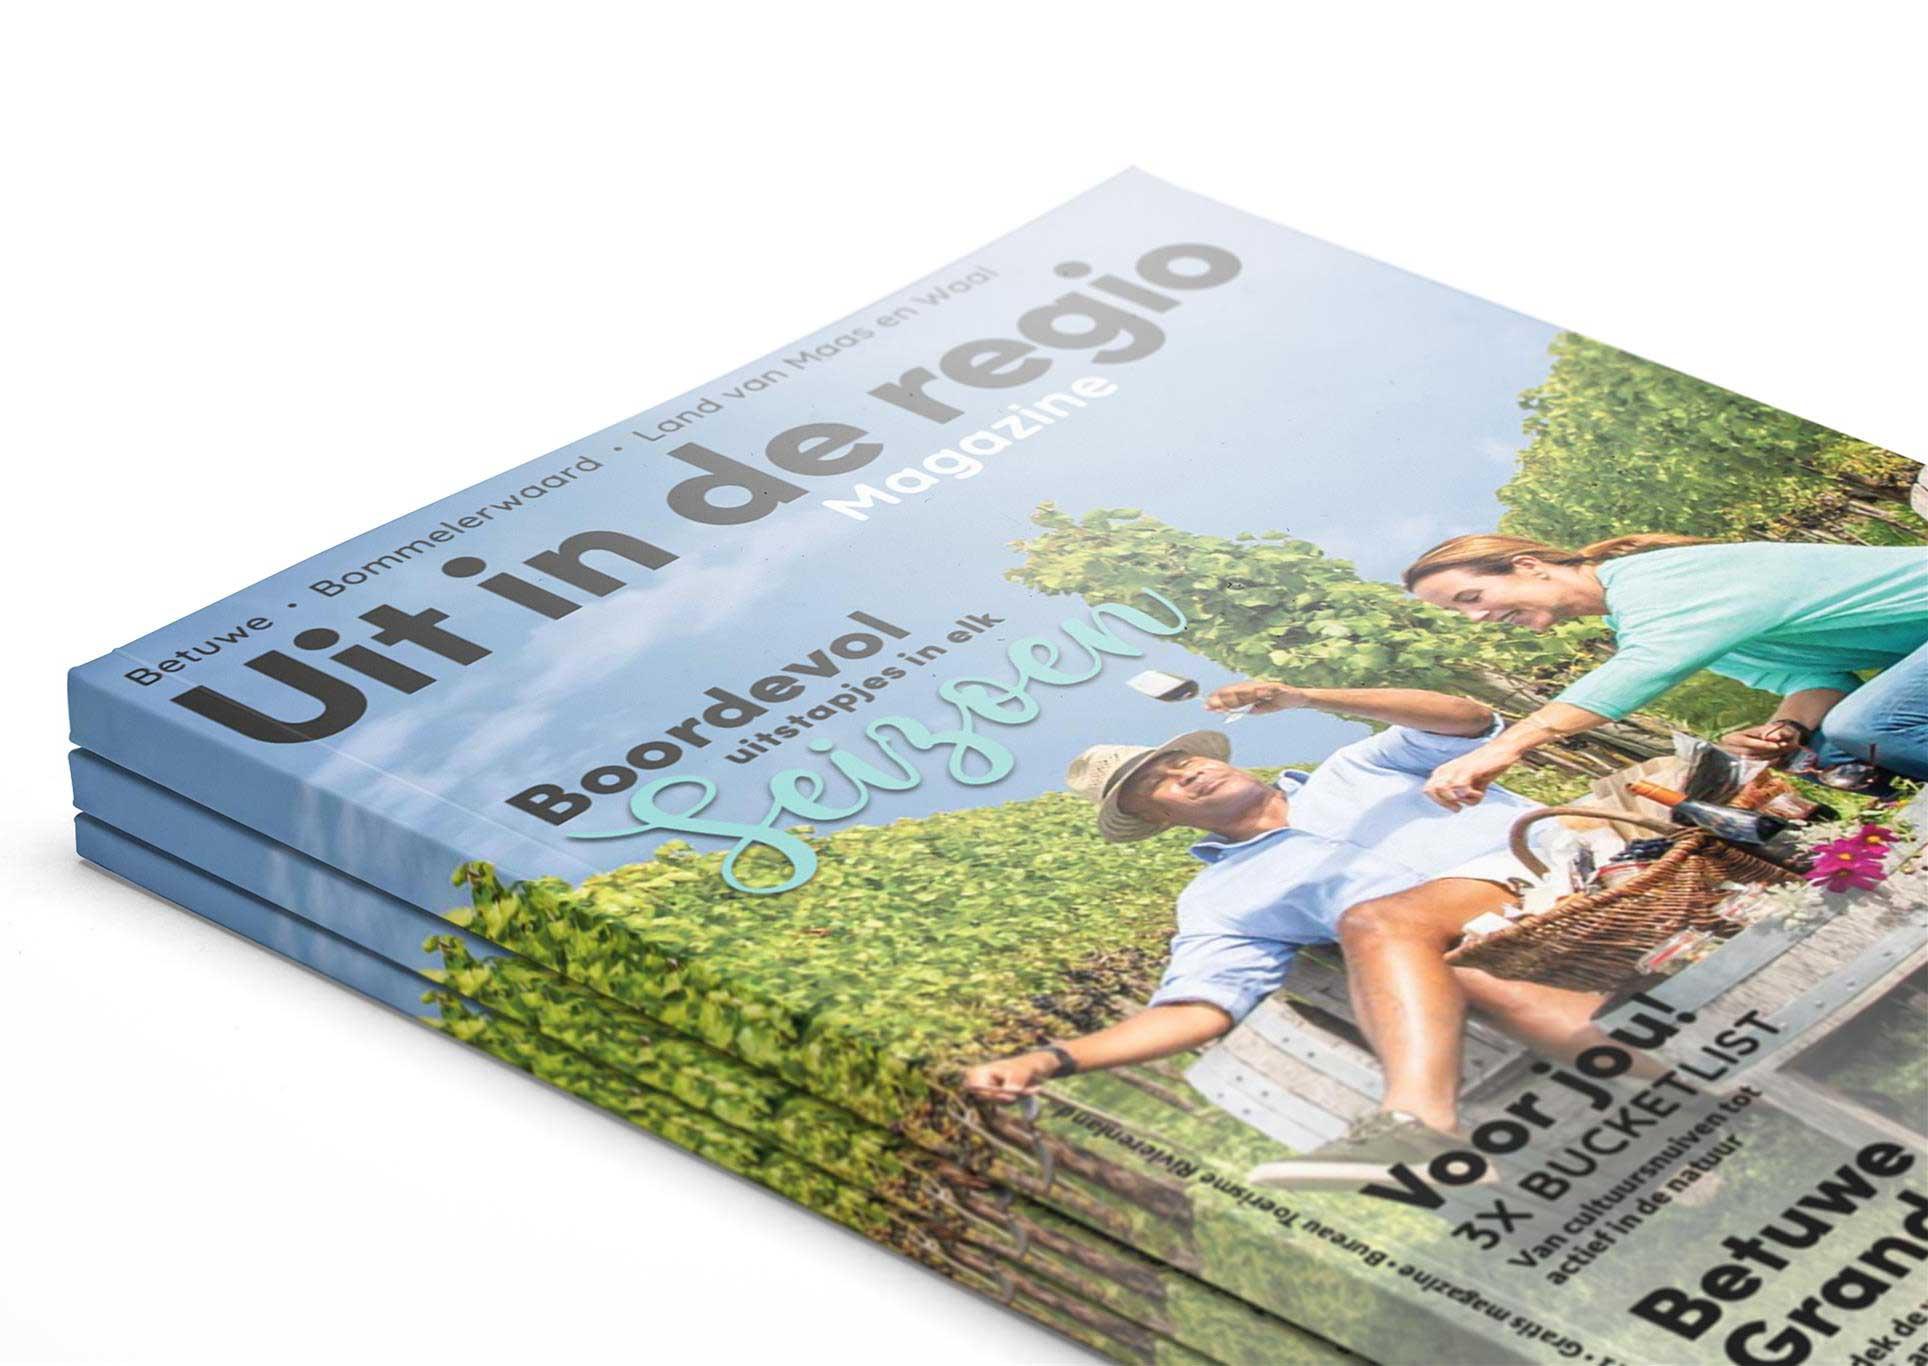 Magazine Uit in de regio 2022